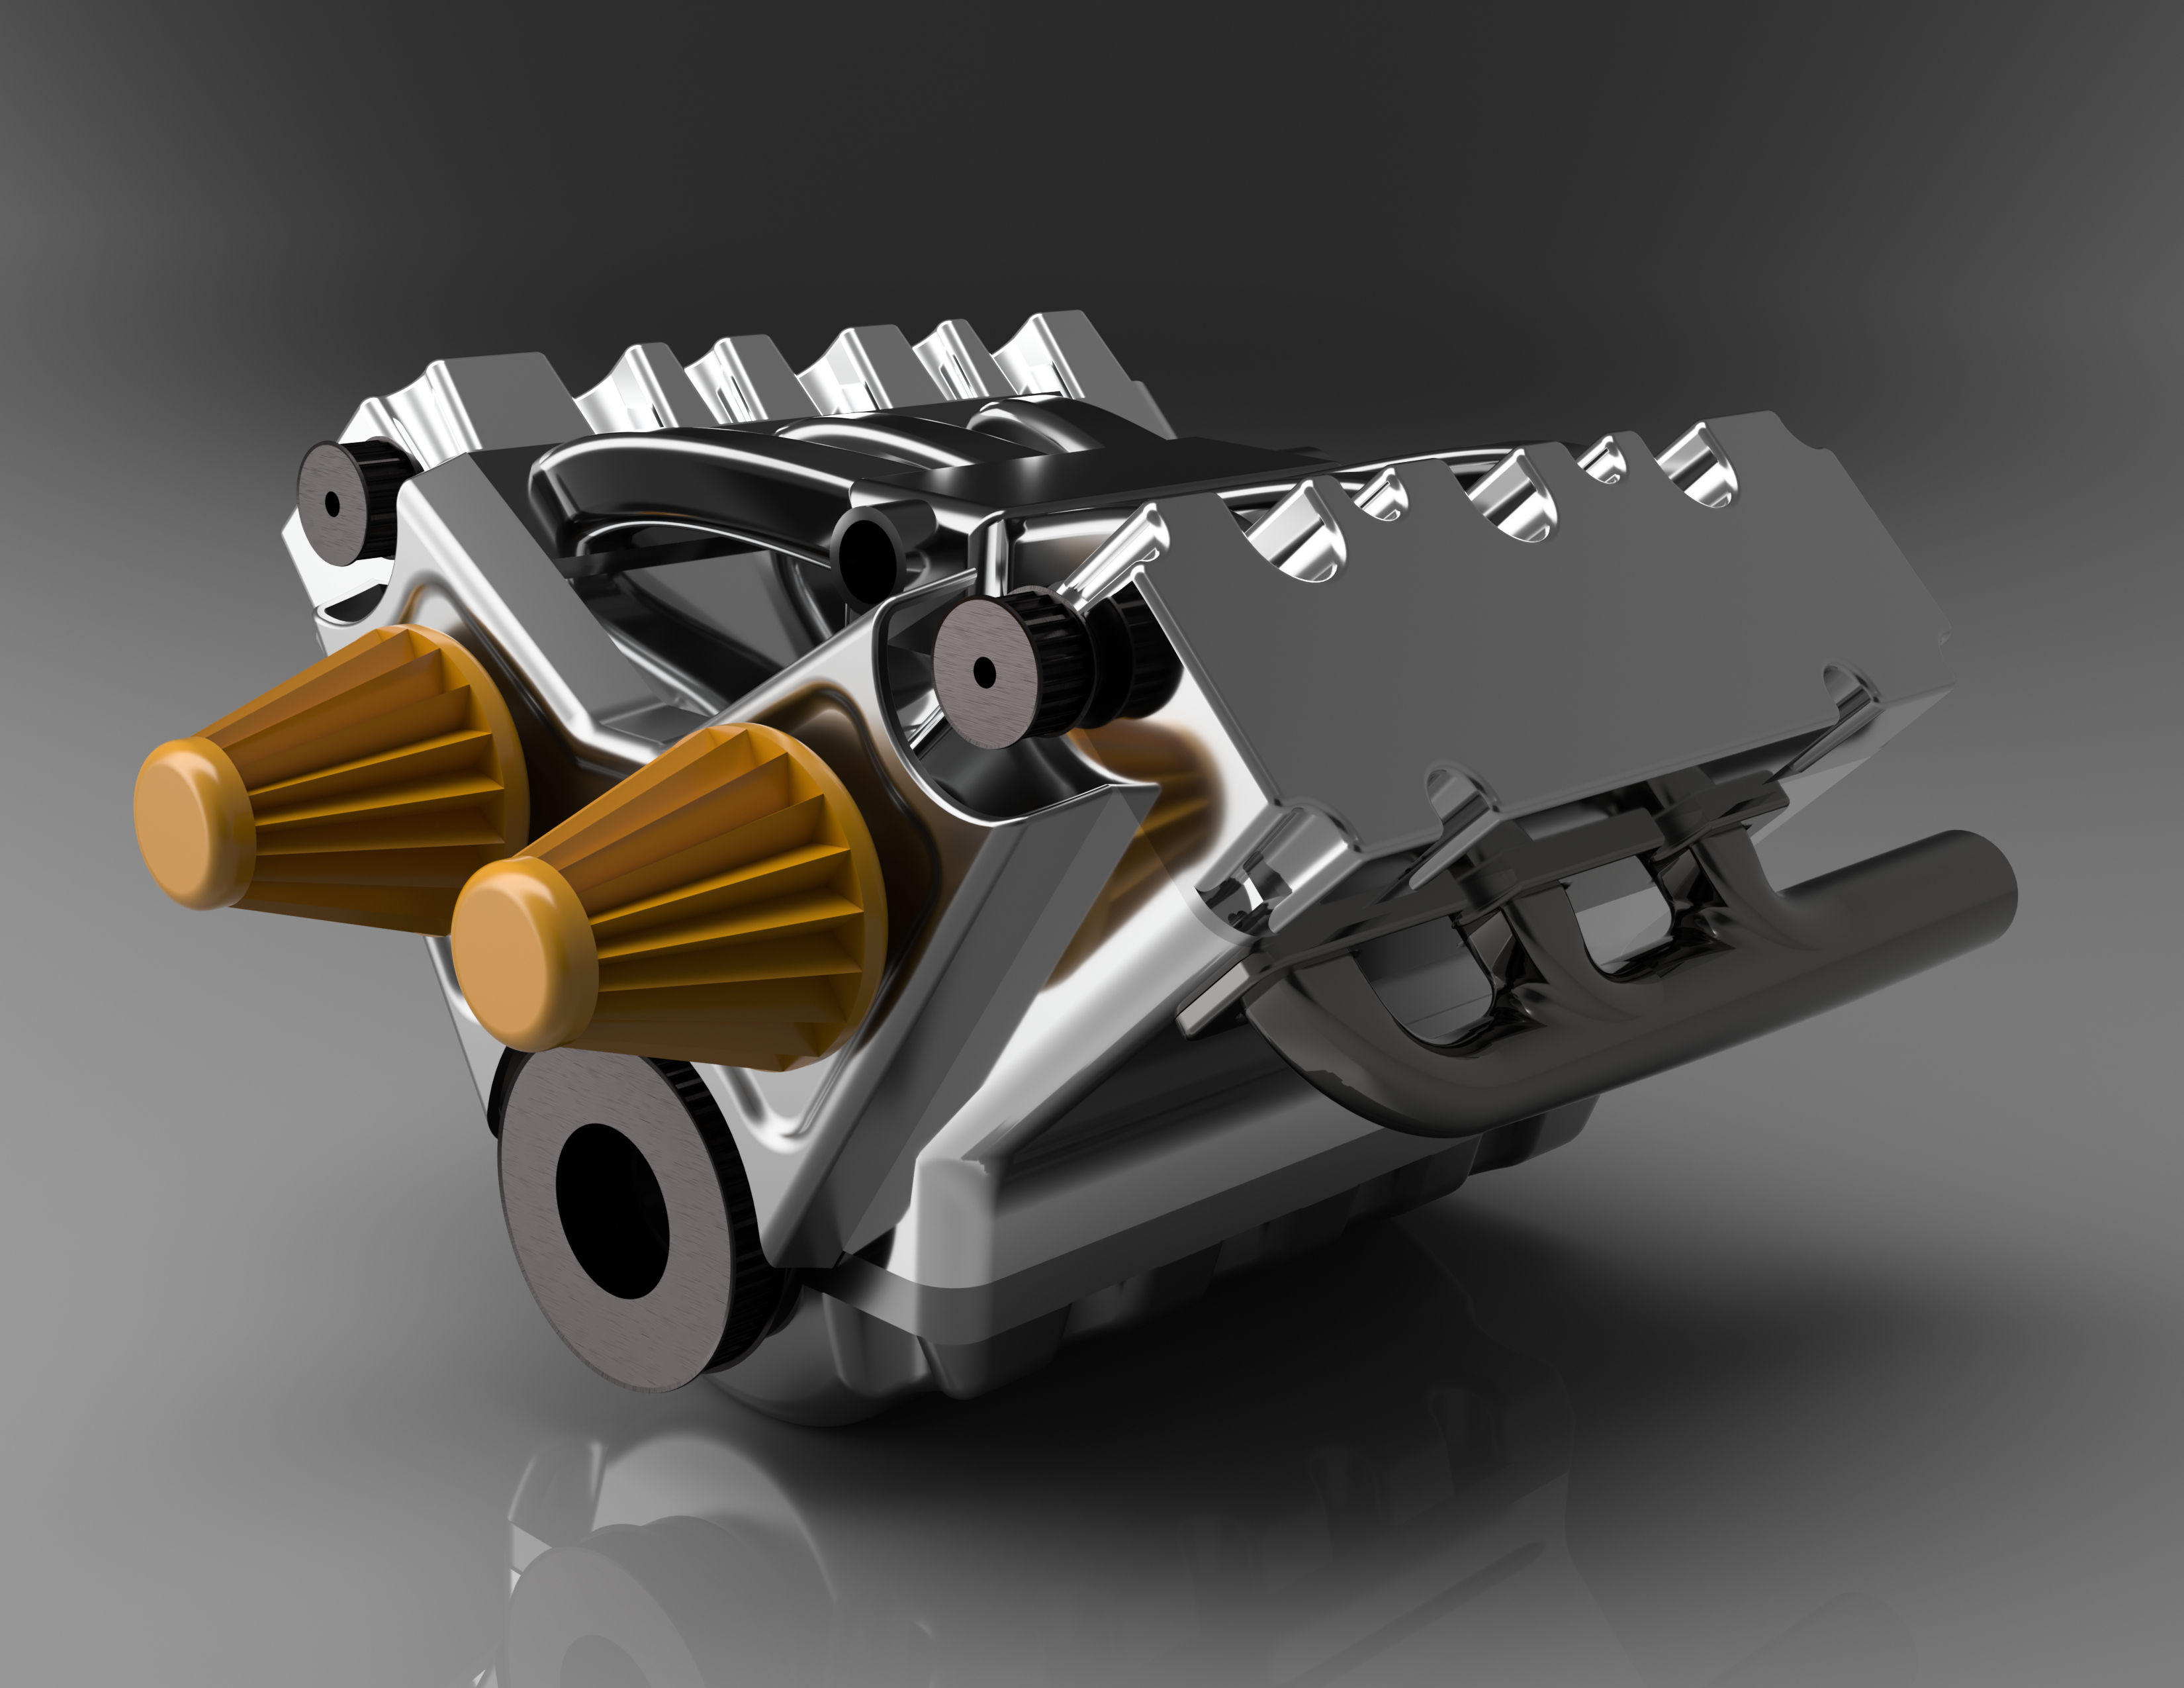 v6 engine autodesk online gallery